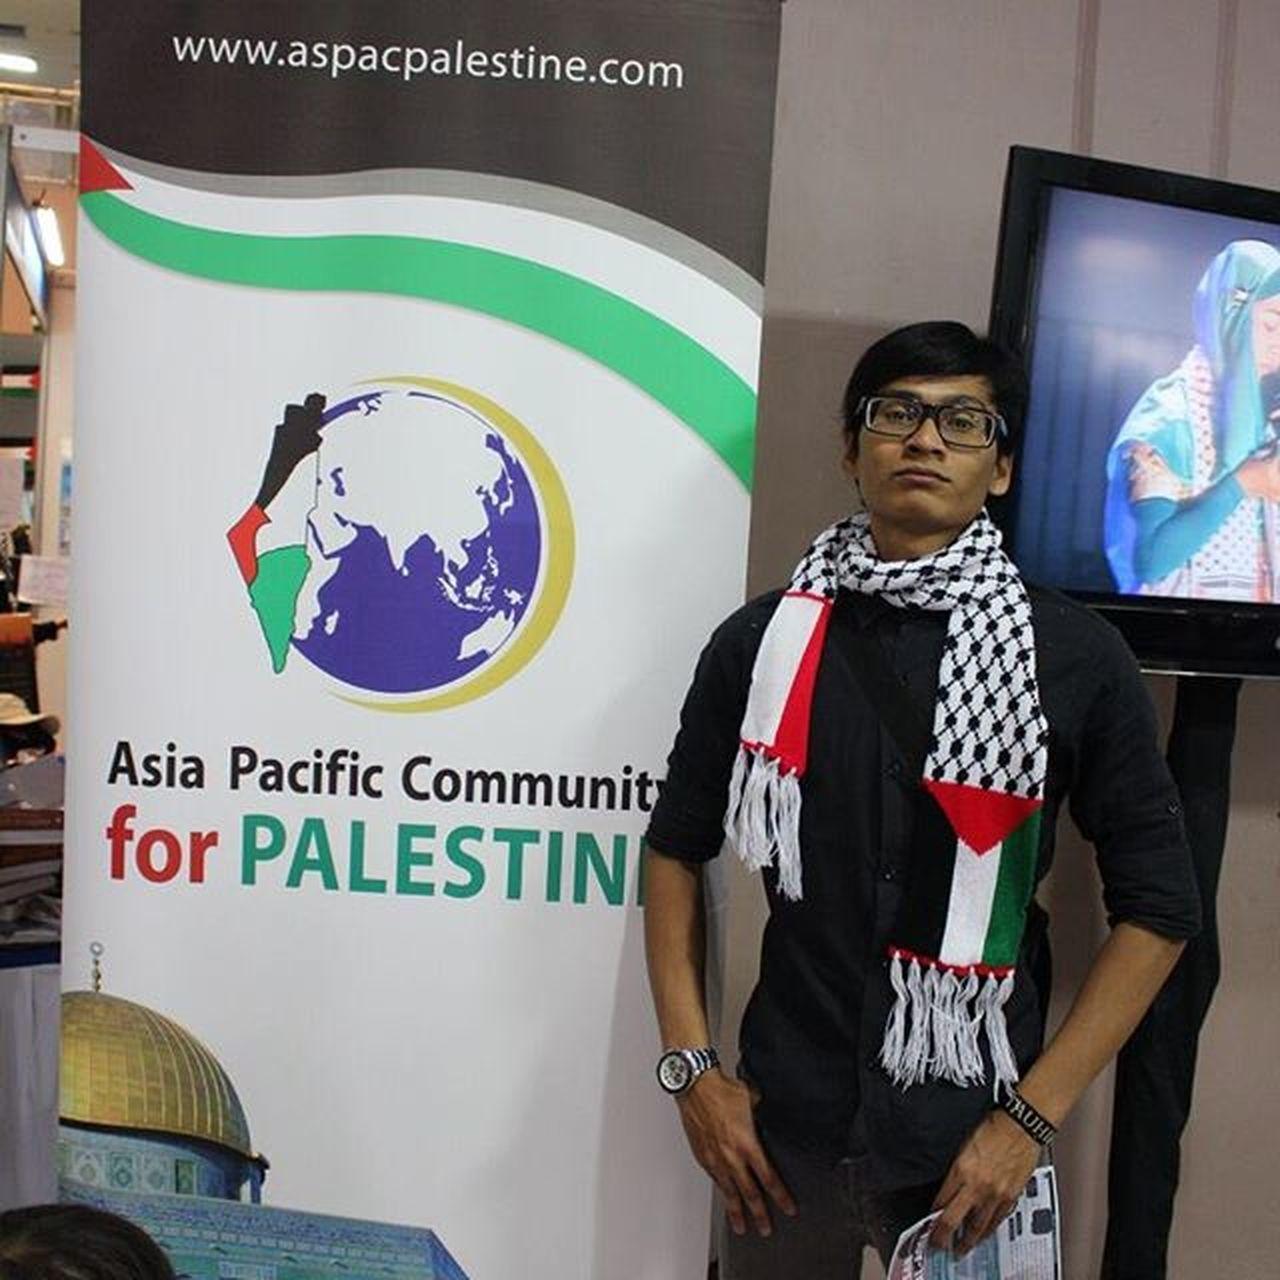 Palestine Will Be Free PSD2015 Freepalestine FreeAlAqsa Spirituality Solidarity HUMANITY